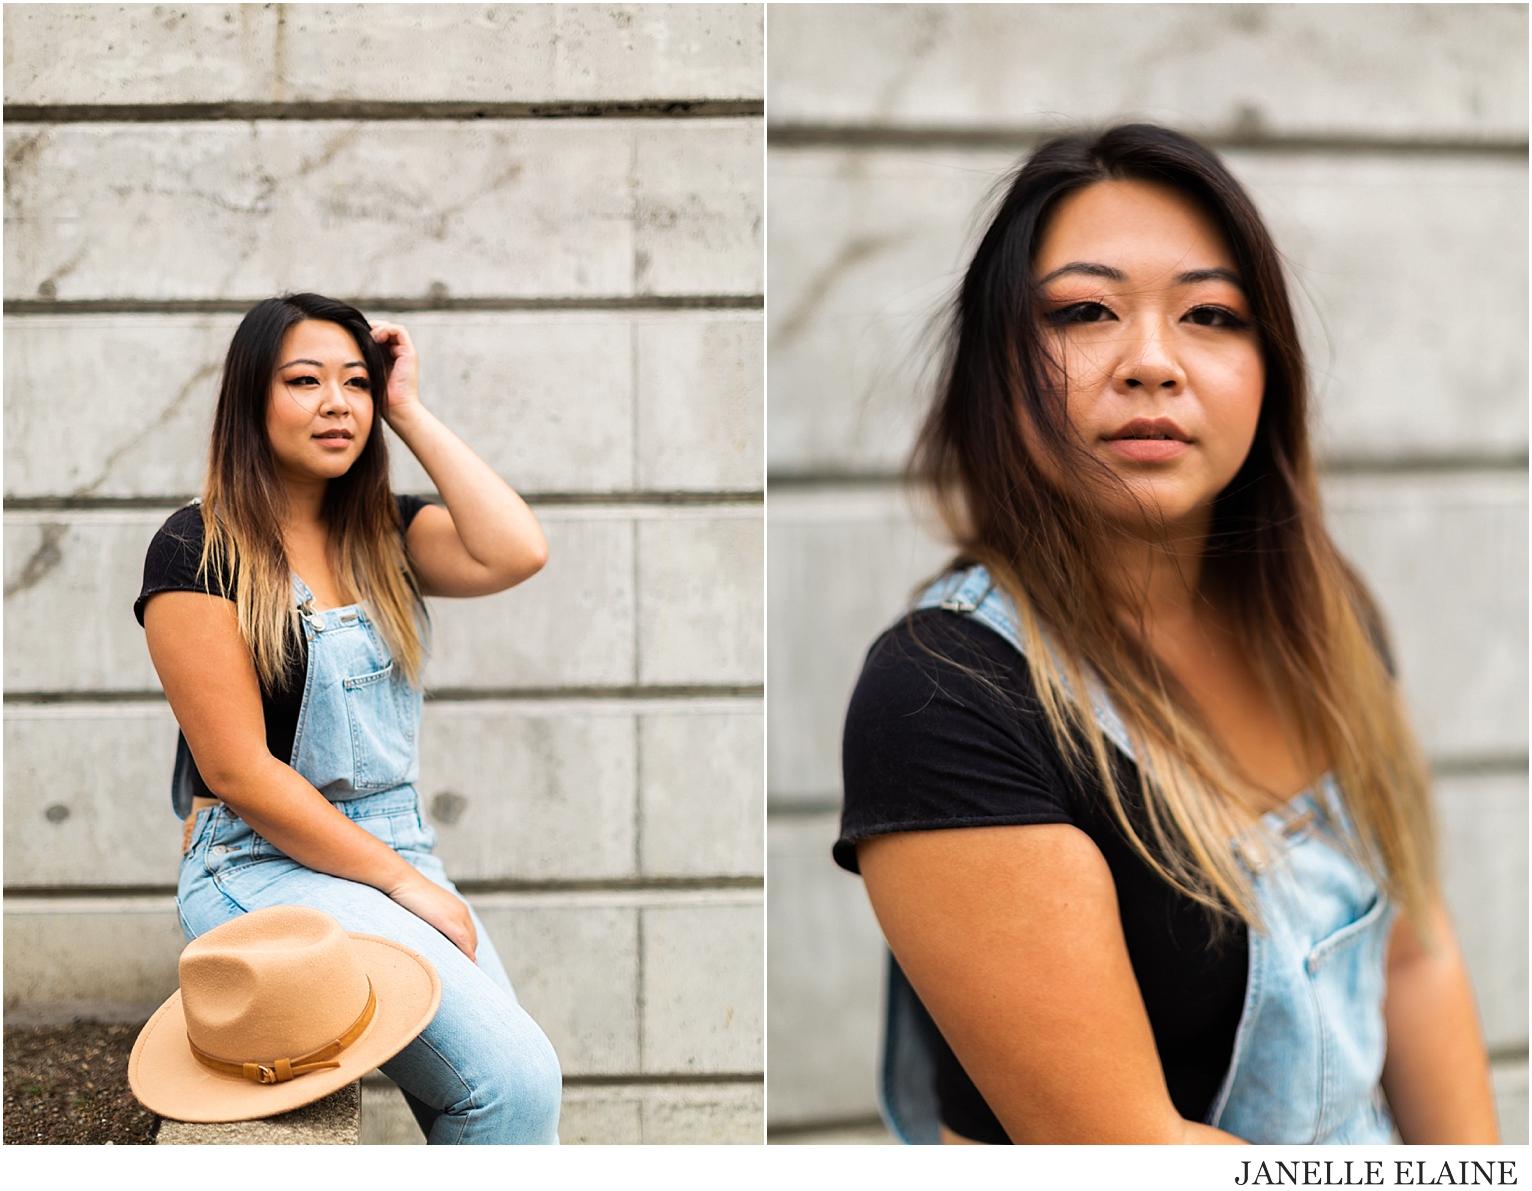 Aiko-Seattle WA-lifestyle photoshoot-Renton-Janelle Elaine Photography-12.jpg